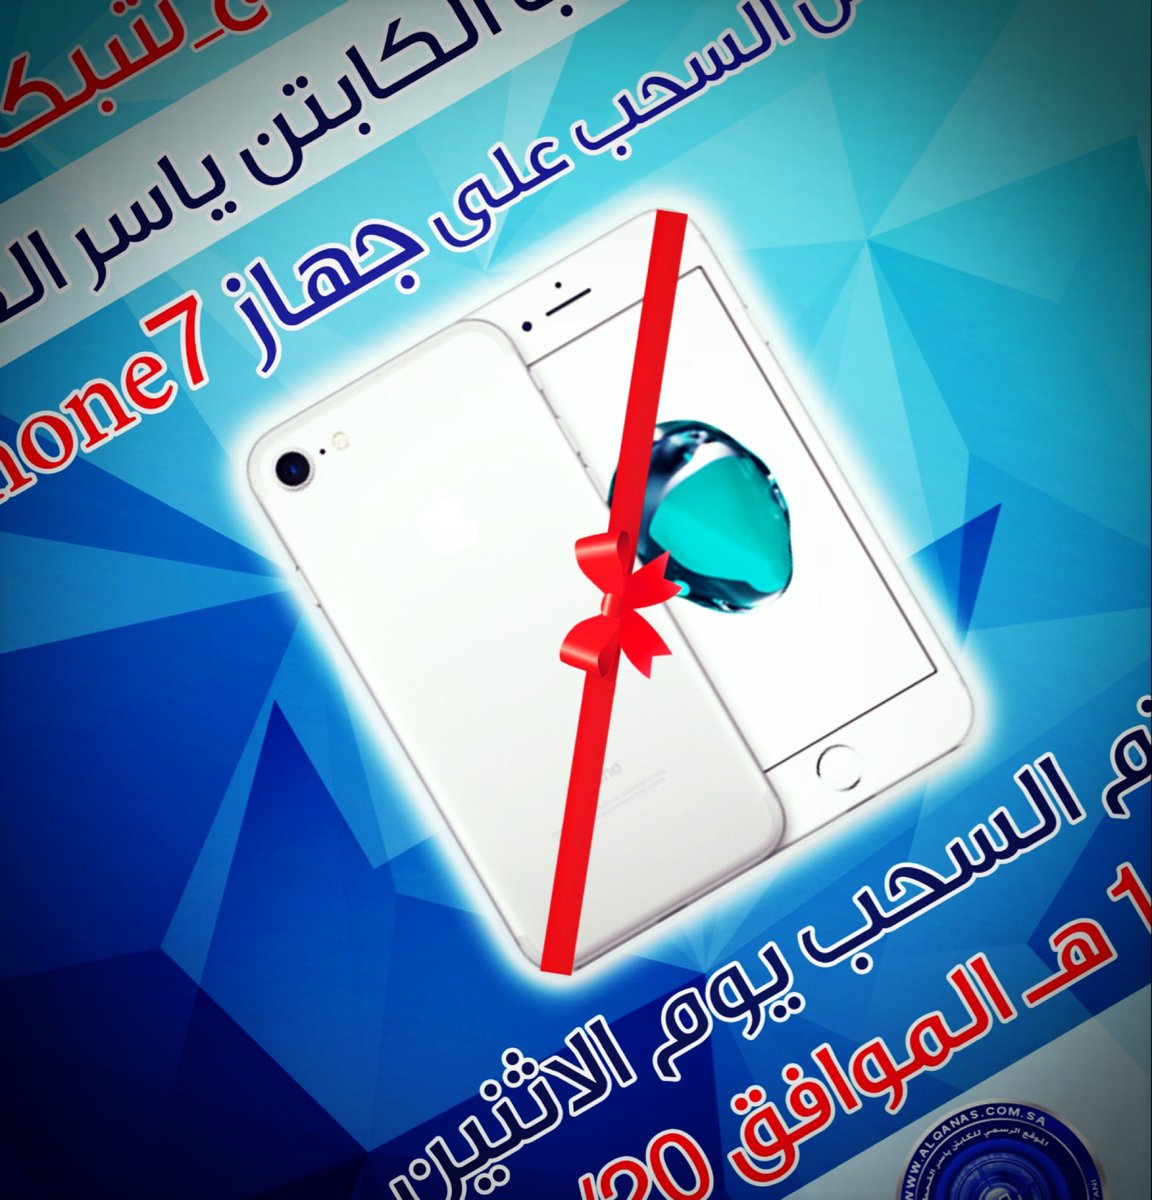 50daa51e8 #اربح_iphone7_مع_شبكة_القناصpic.twitter.com/y81XAw87Rn